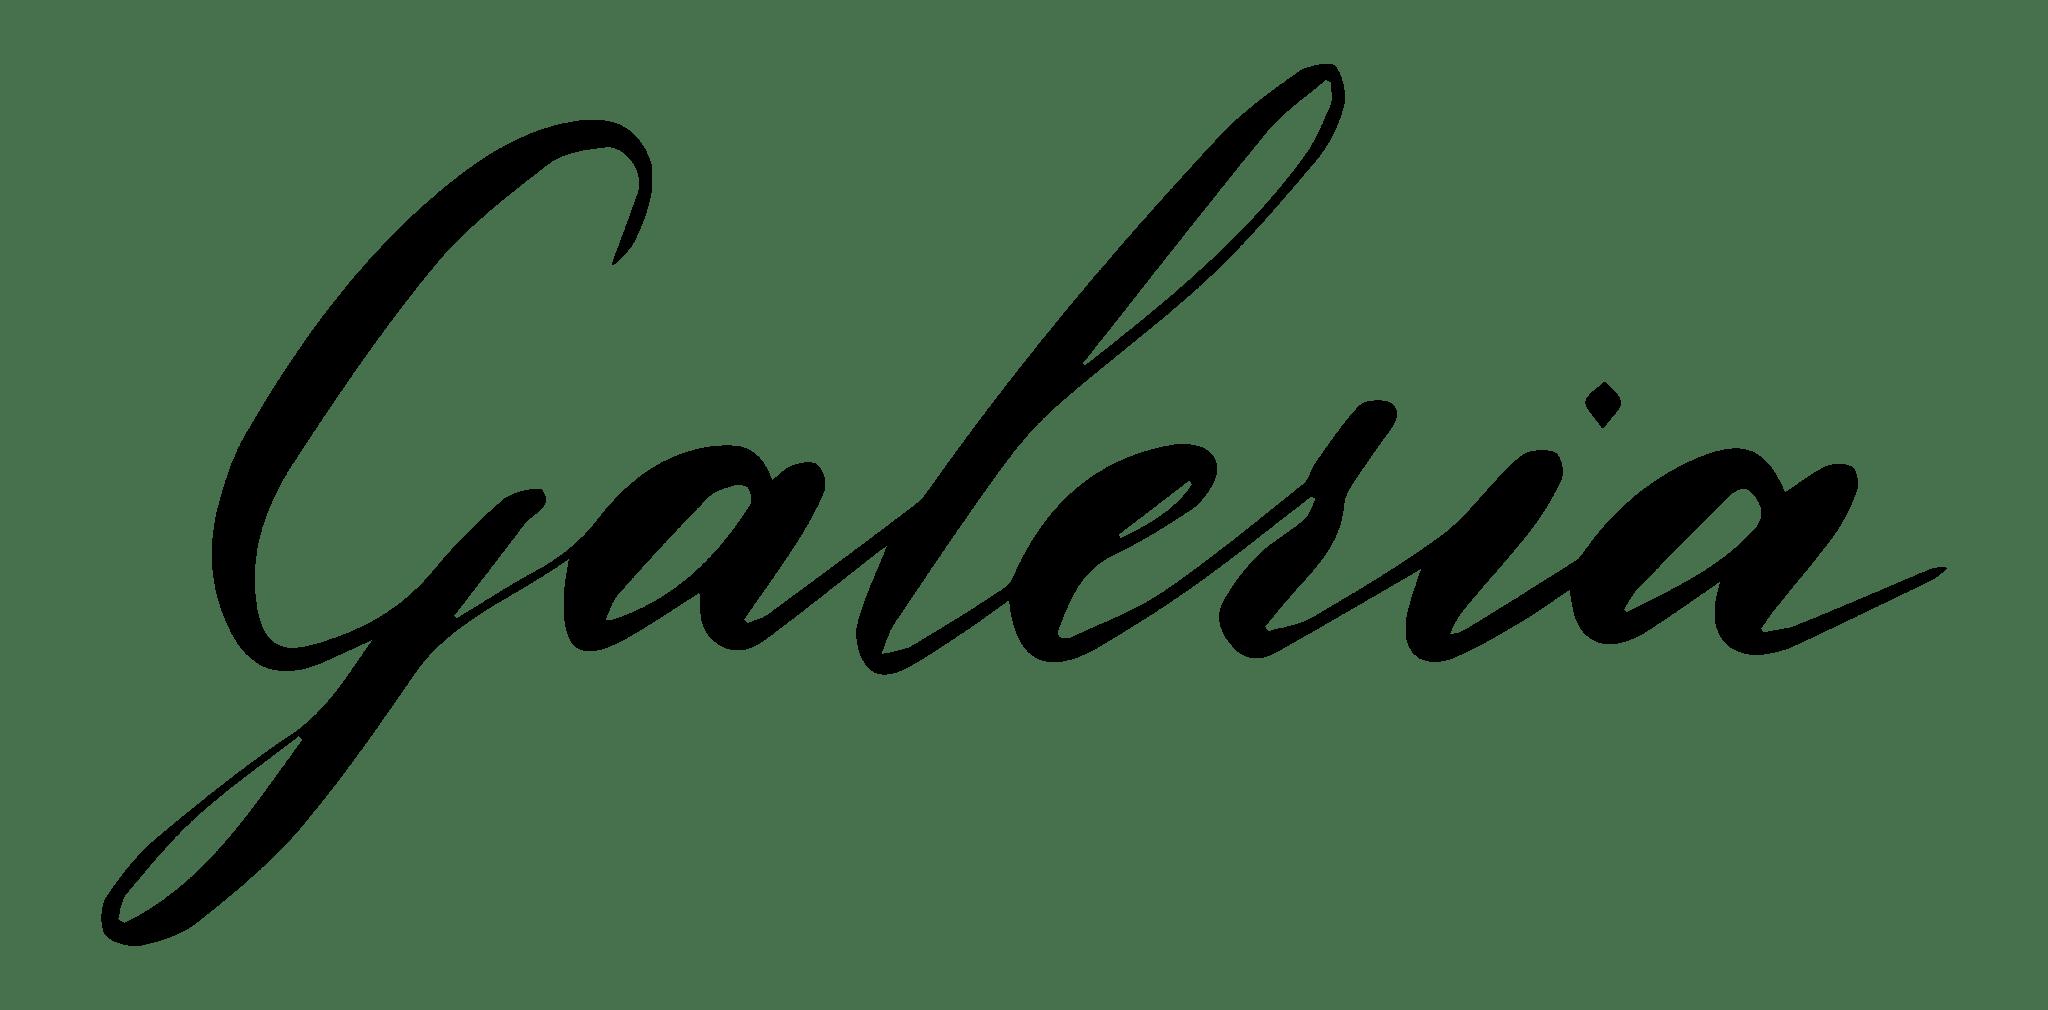 Tytuł kaligrafia Galeria